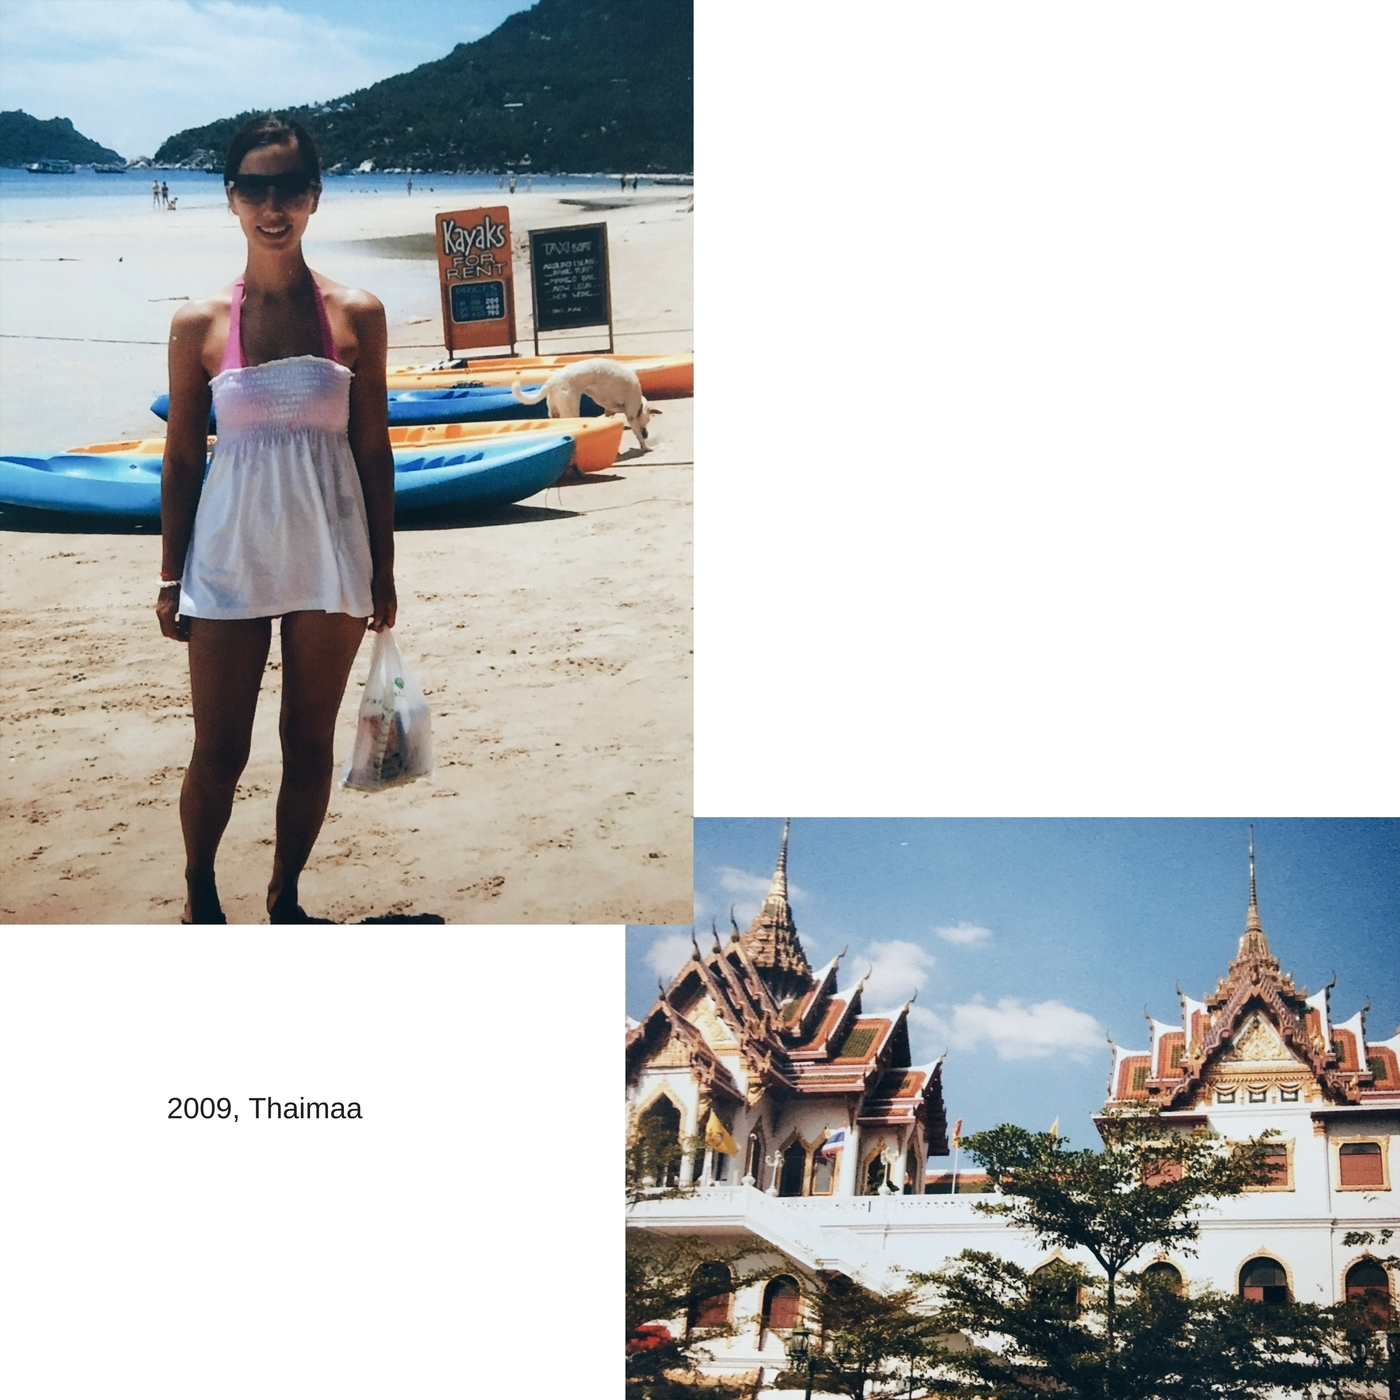 thaimaa 2009.jpg